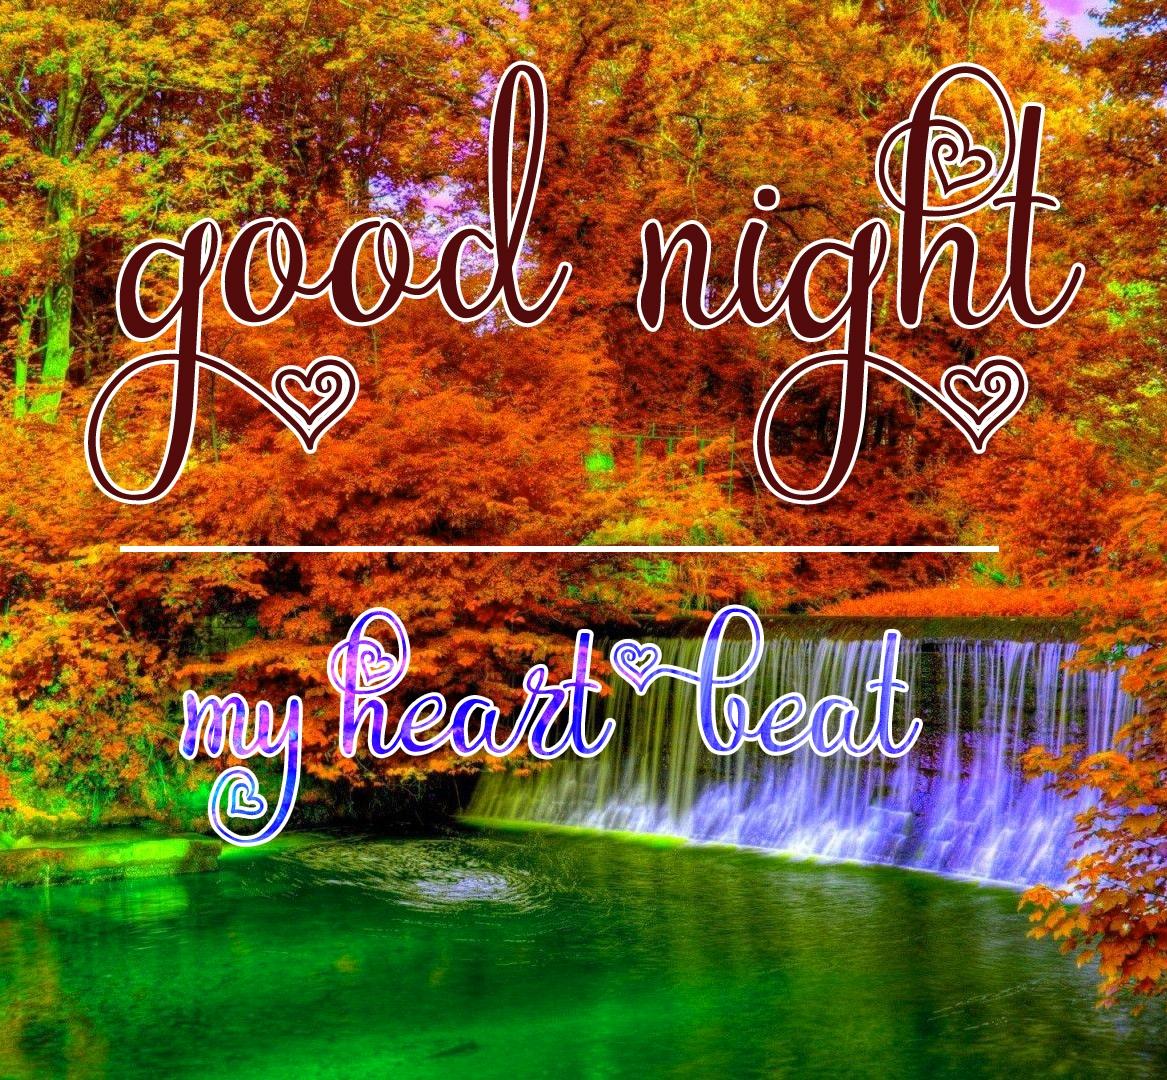 Free good night Images 30